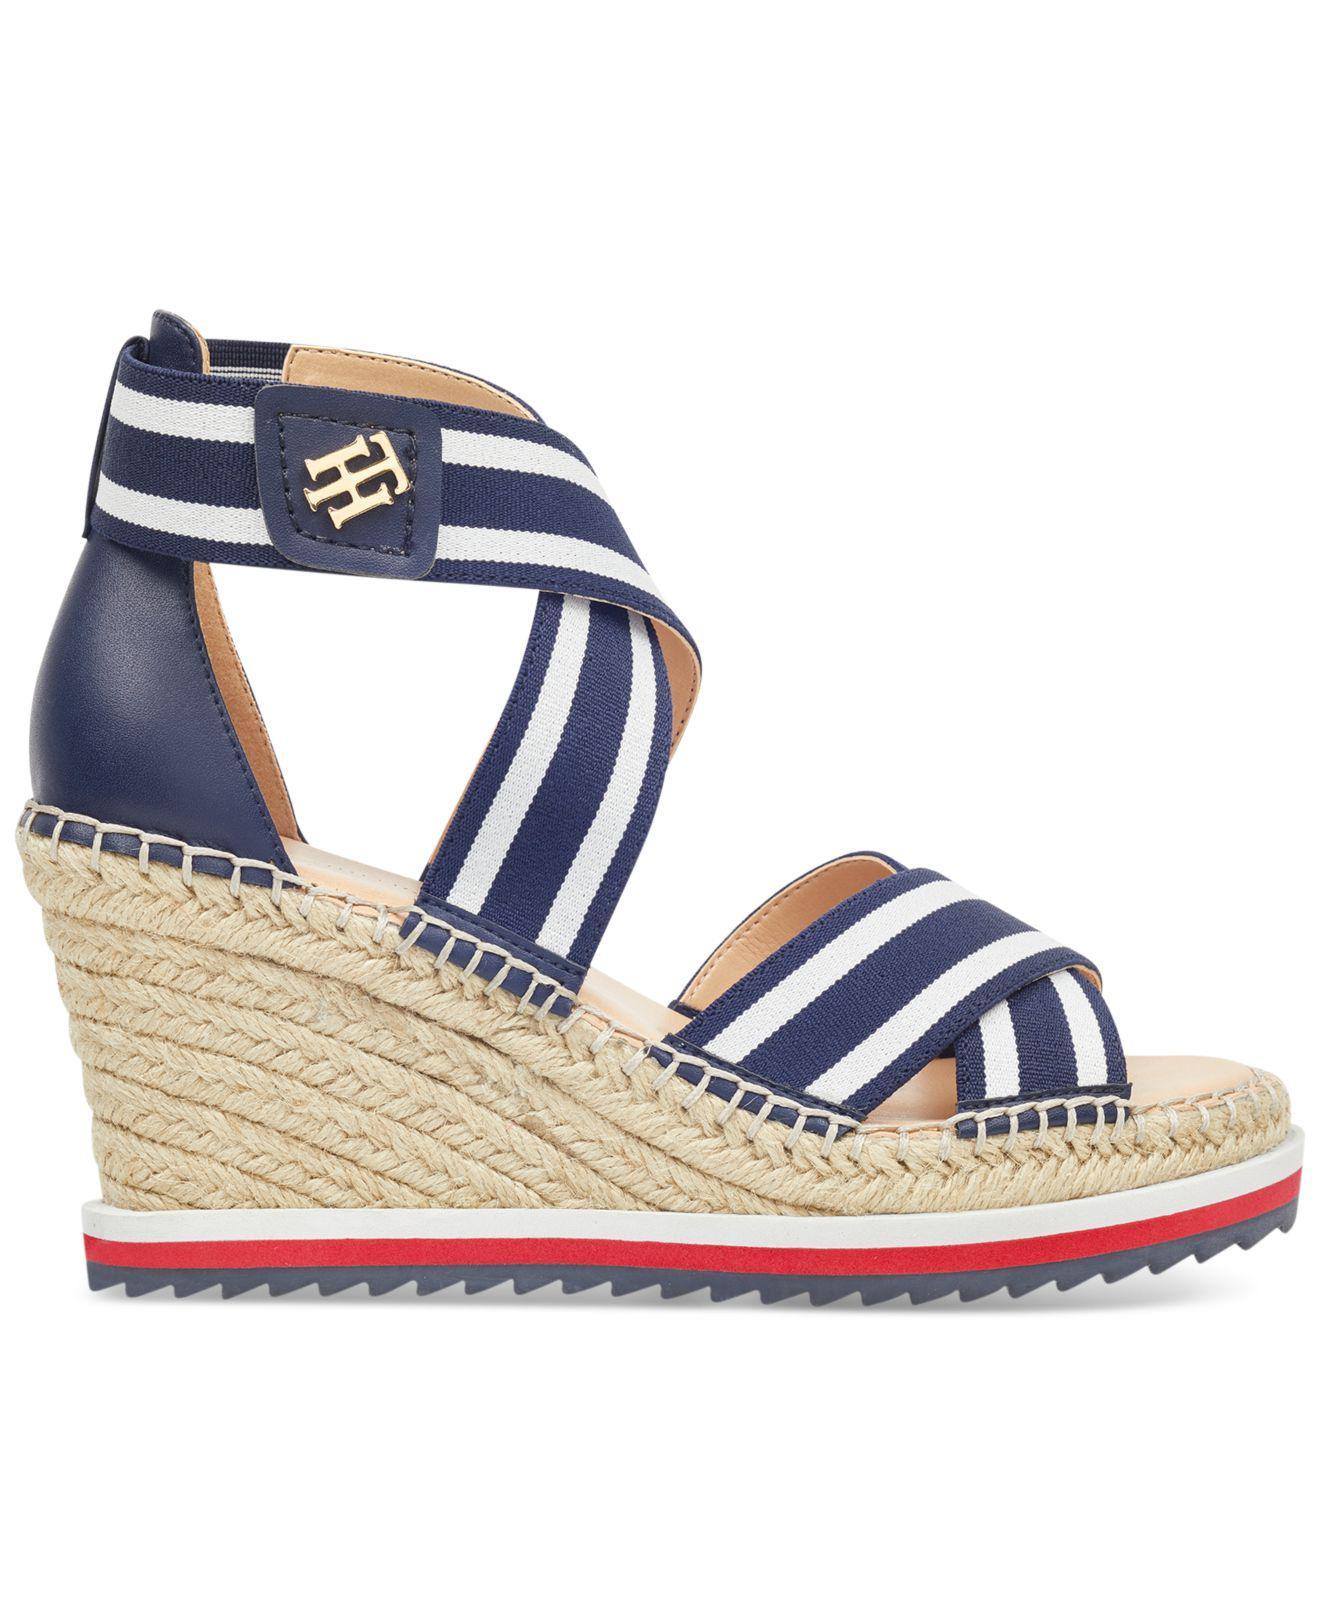 6d09b14d9 Lyst - Tommy Hilfiger Yesia Espadrille Platform Wedge Sandals